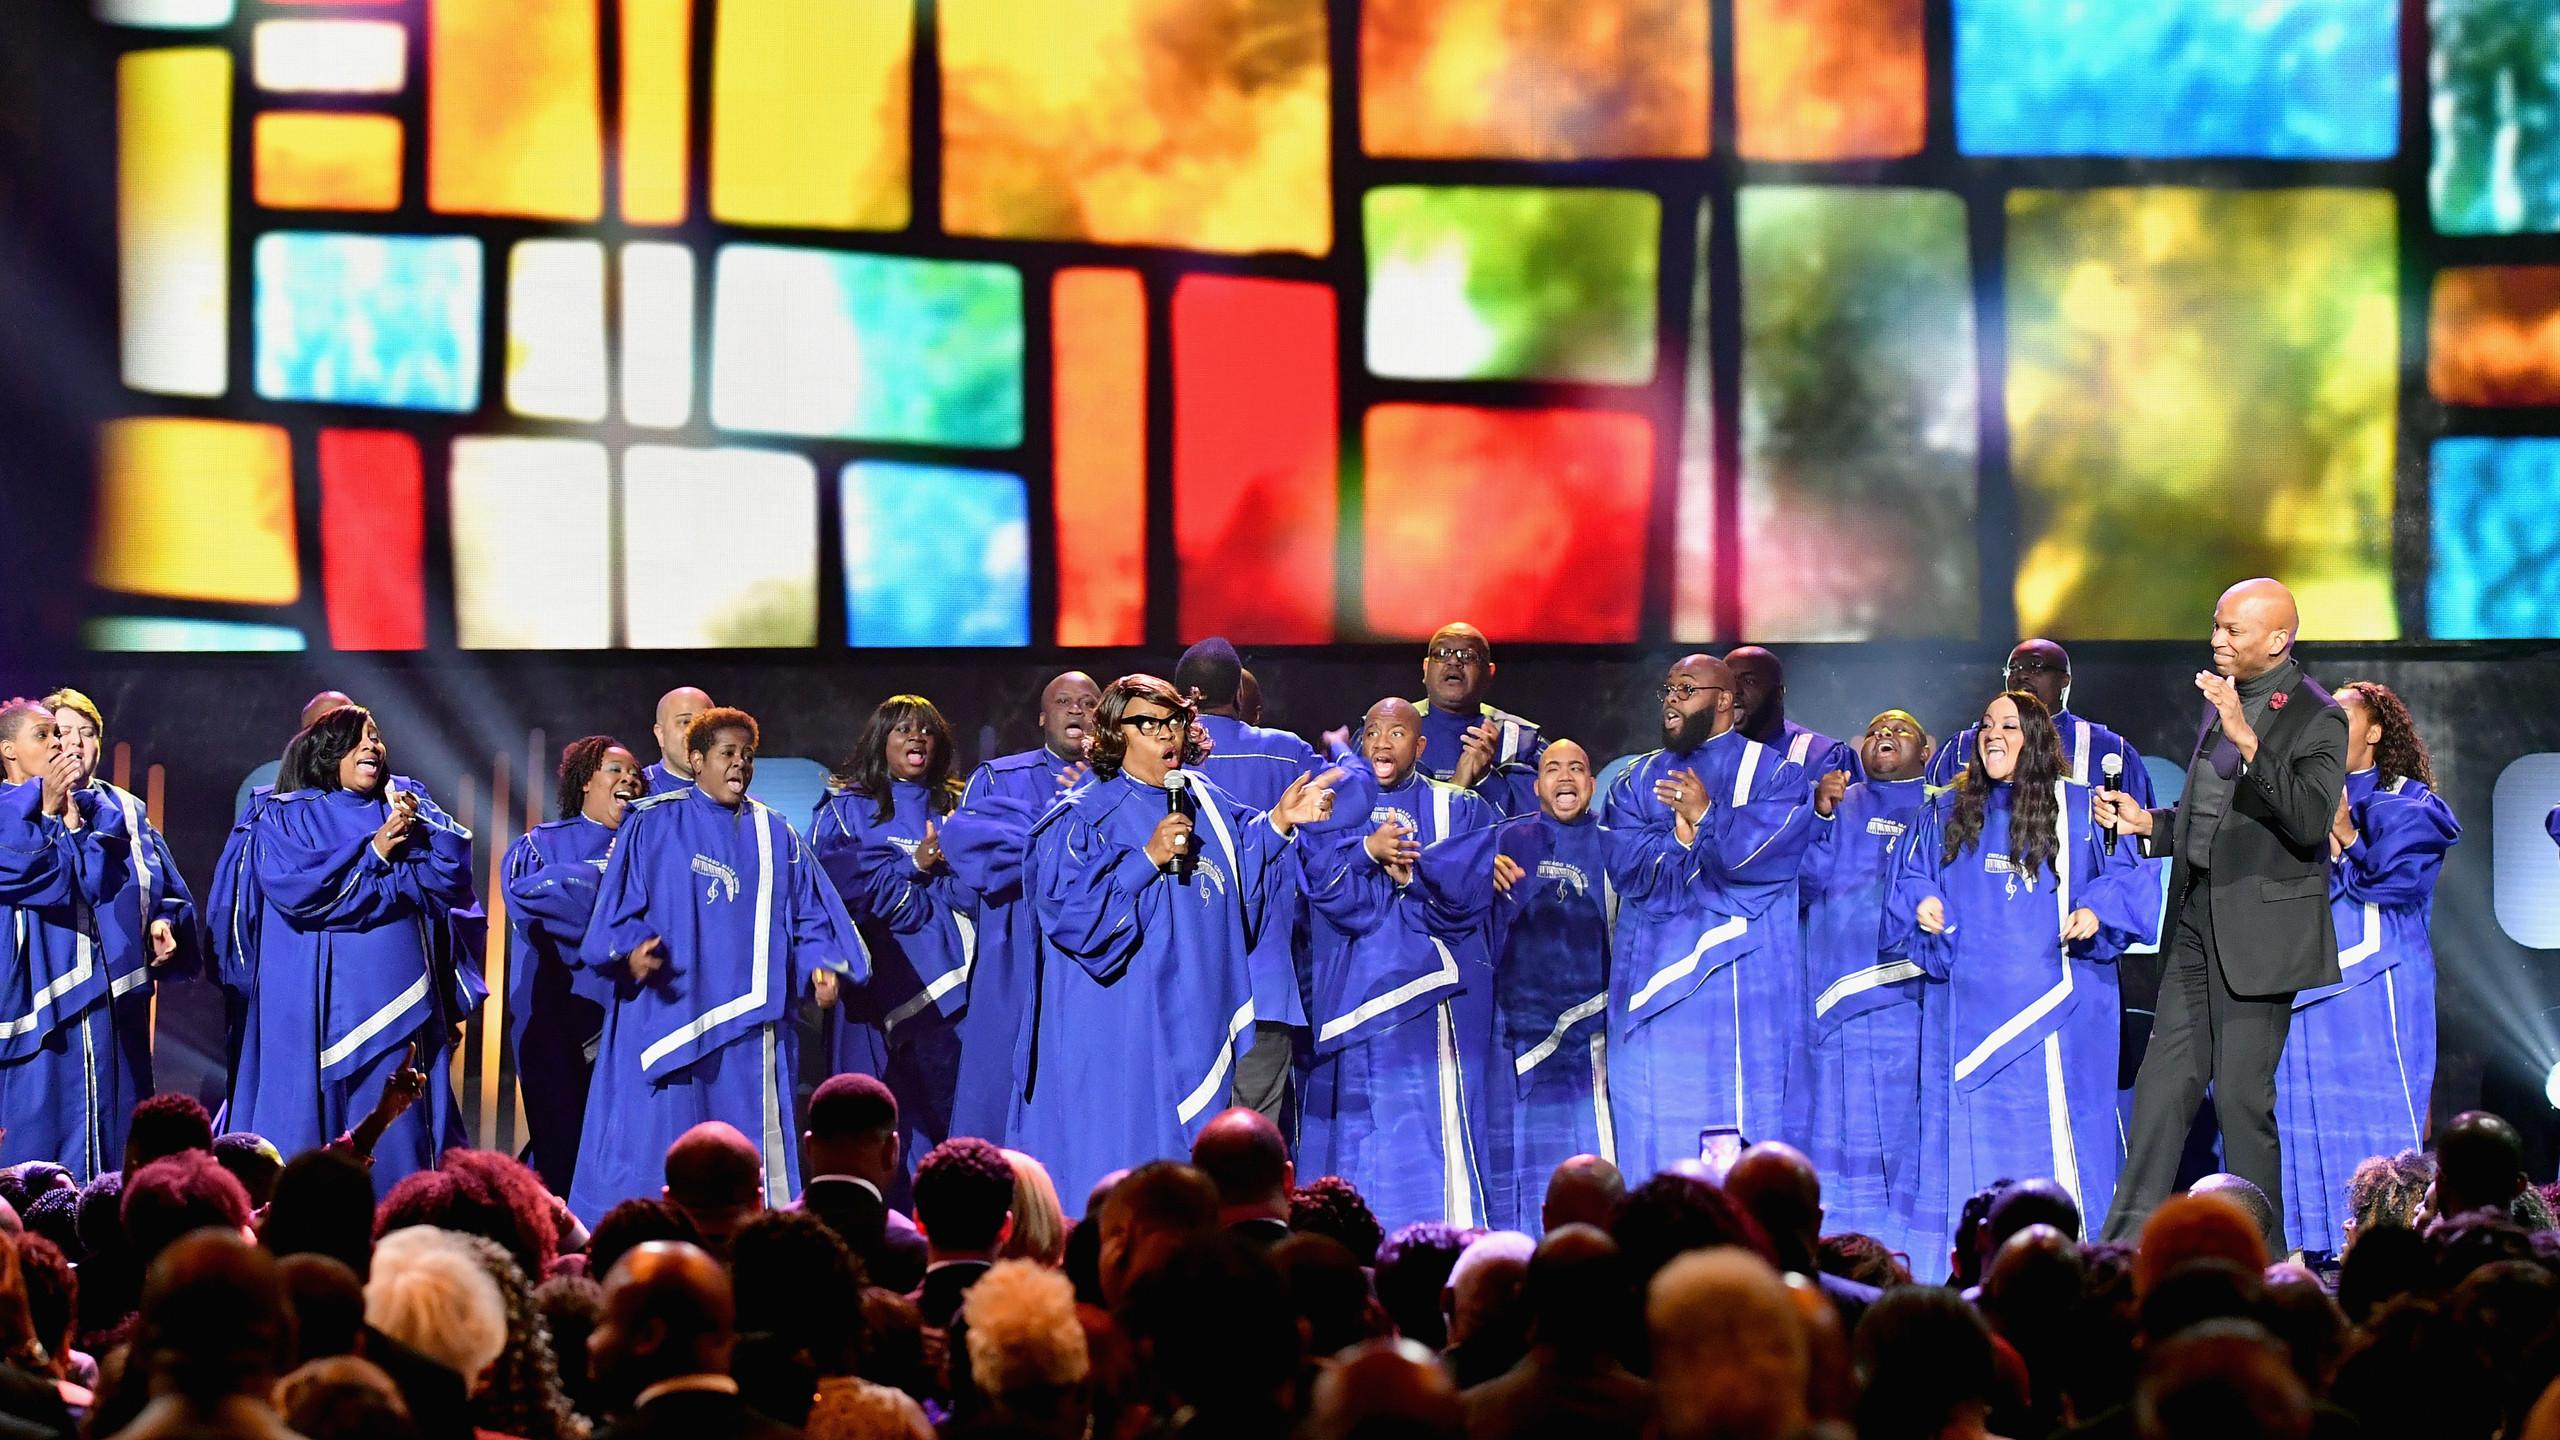 Chicago Mass Choir performs